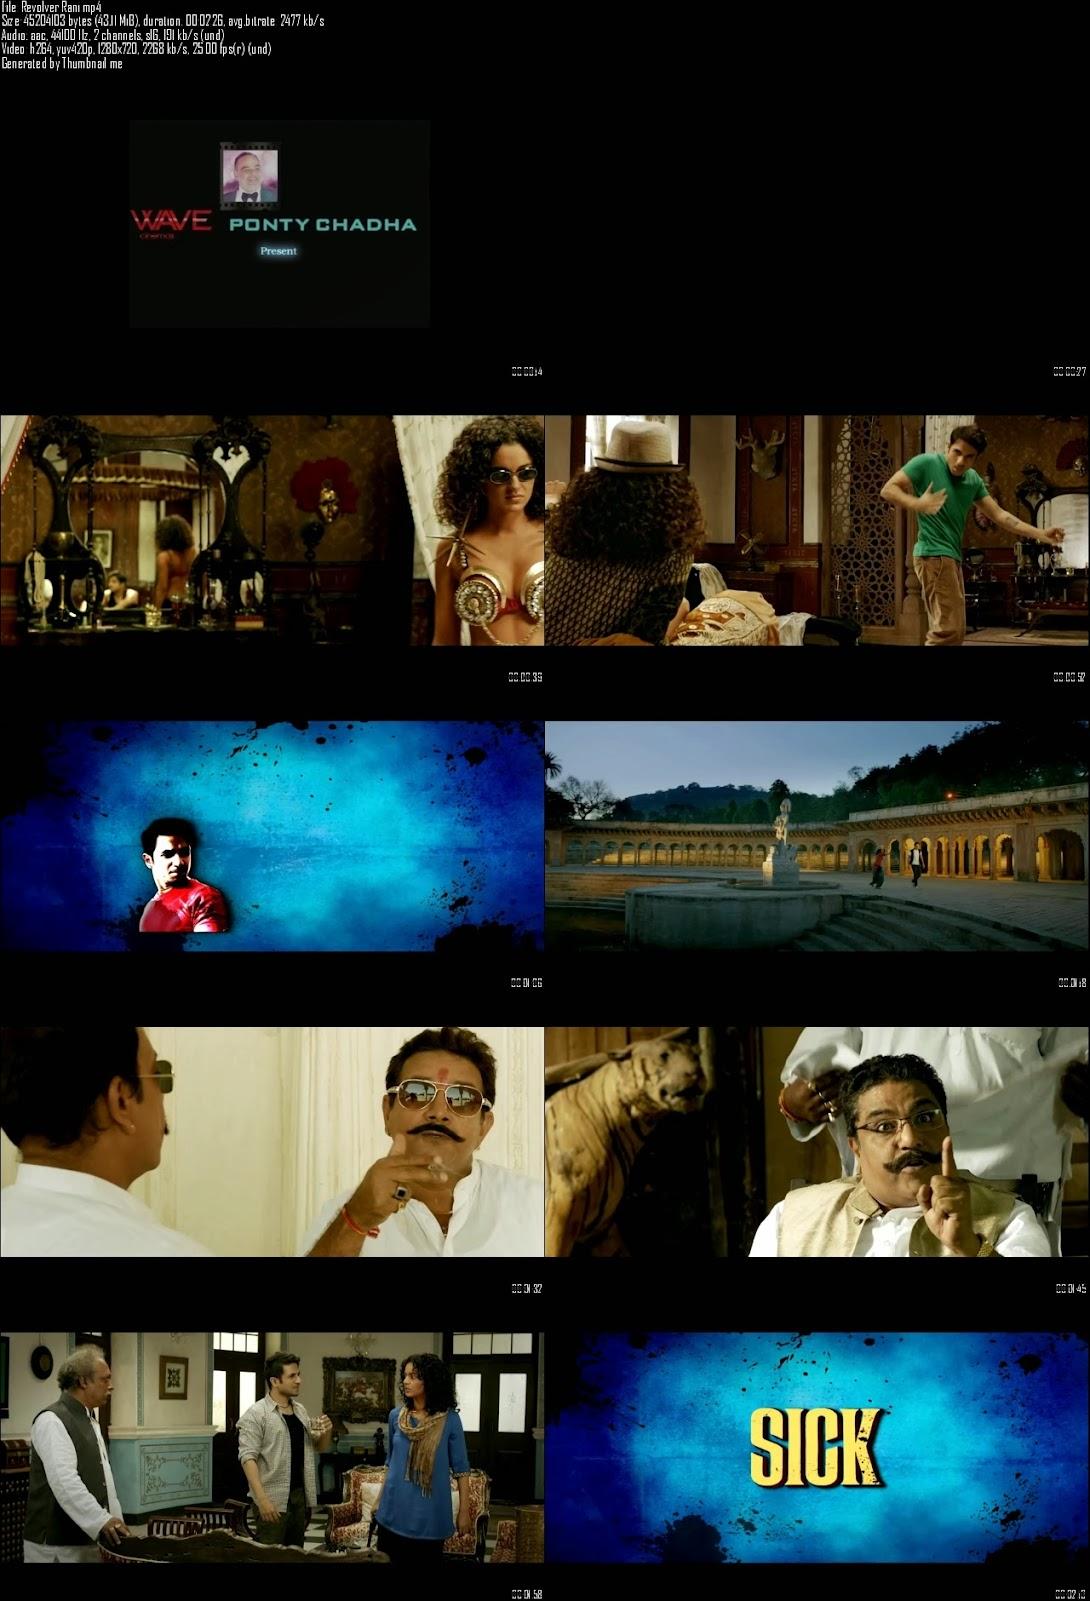 Revolver Rani (2014) Hindi Movie Official Trailer   world4free, Revolver Rani (2014) Movie Official Trailer, Revolver Rani (2014) Movie Official Trailer , free Revolver Rani (2014) Movie Official Trailer , full movie Revolver Rani (2014) Movie Official Trailer , download Revolver Rani (2014) Movie Official Trailer, world4free.cc/world4free/world4freeu/worldfree/worldfree4u/World4free, Revolver Rani (2014) Movie Official Trailer.